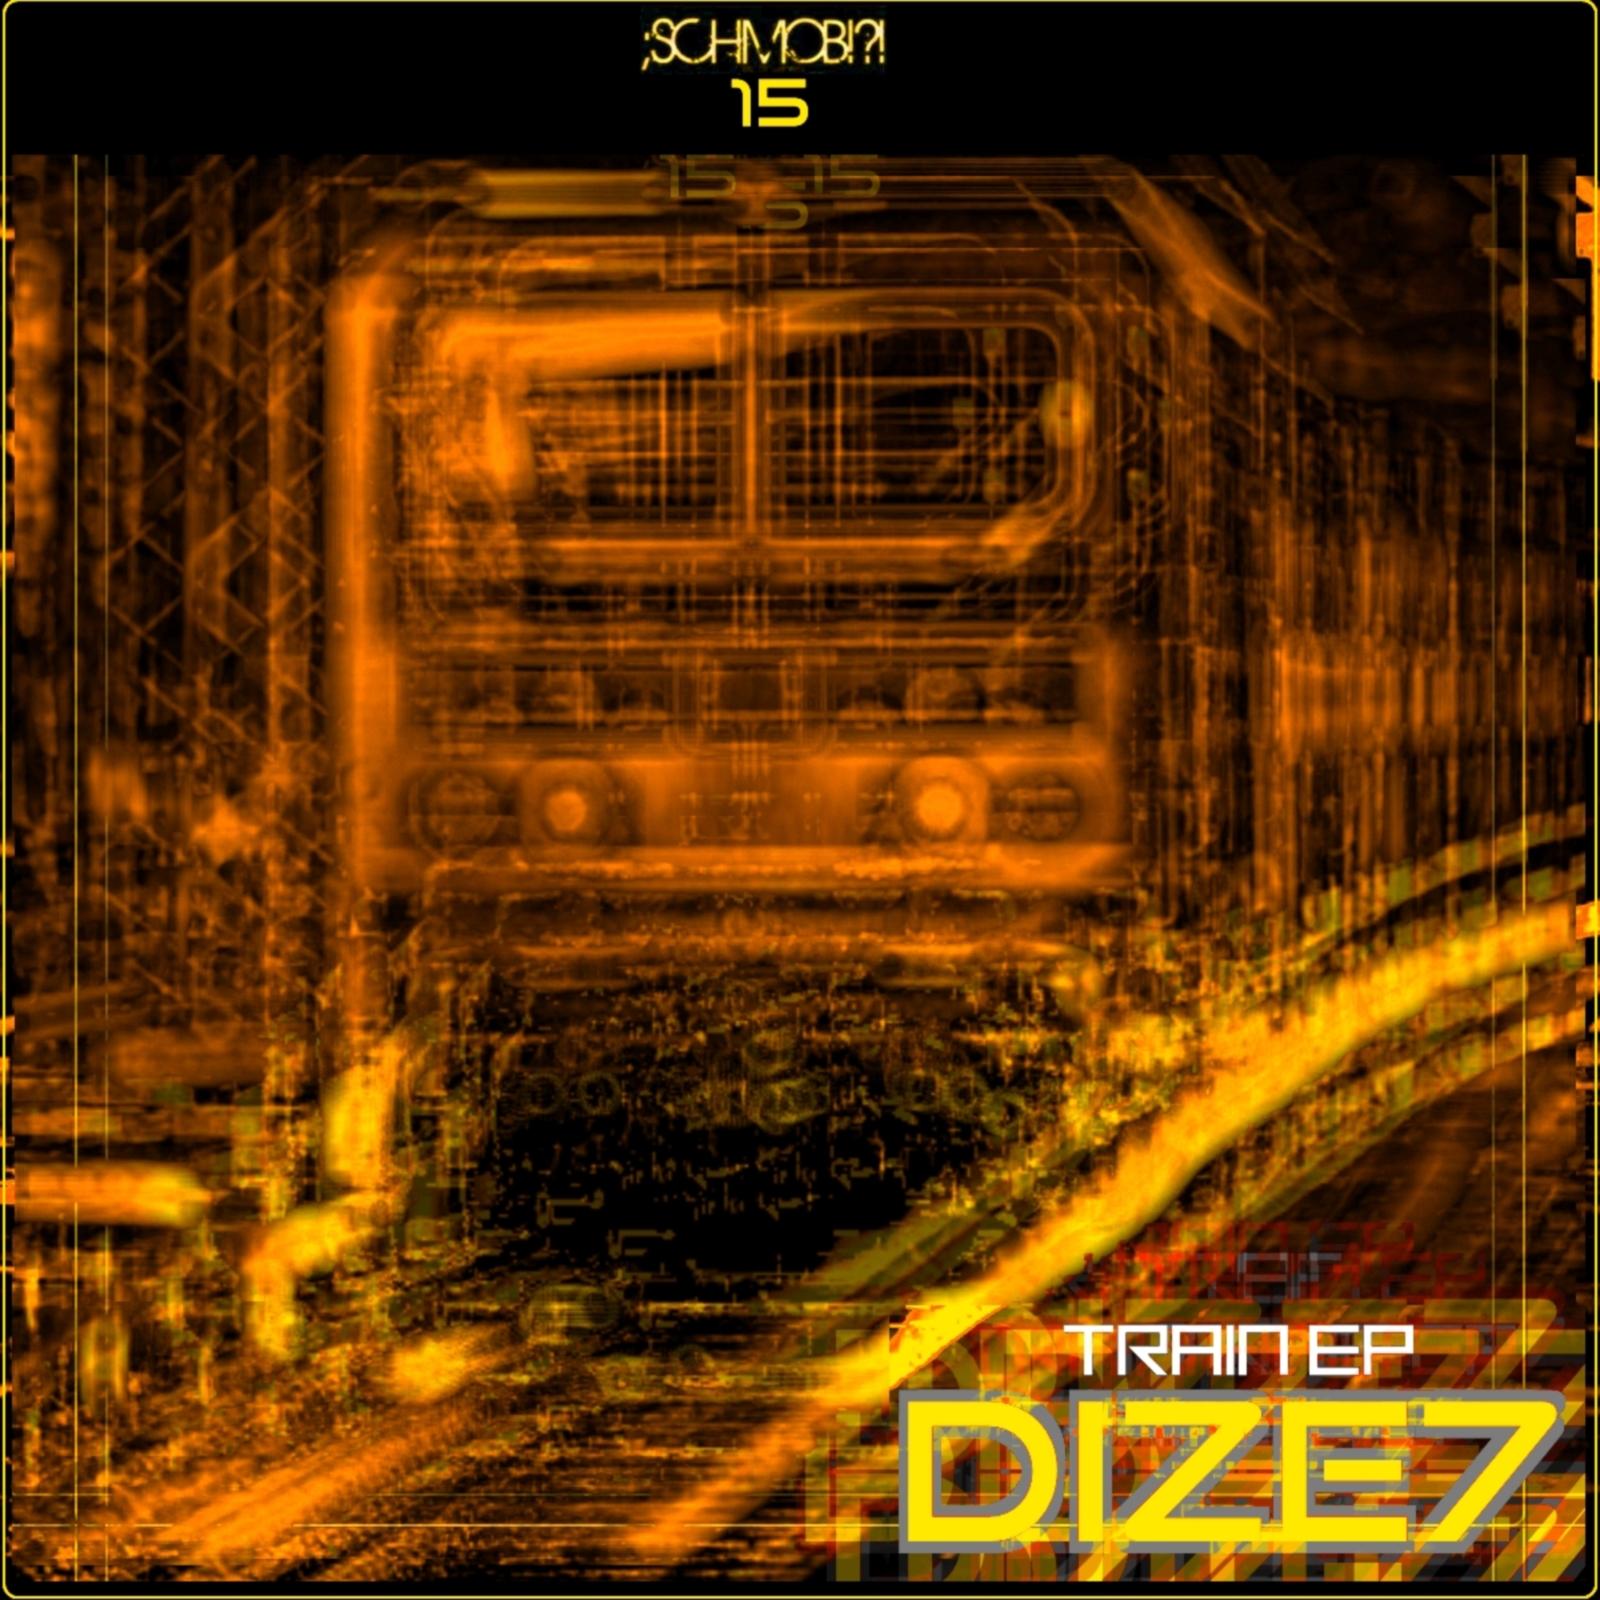 Dize7 – Train EP